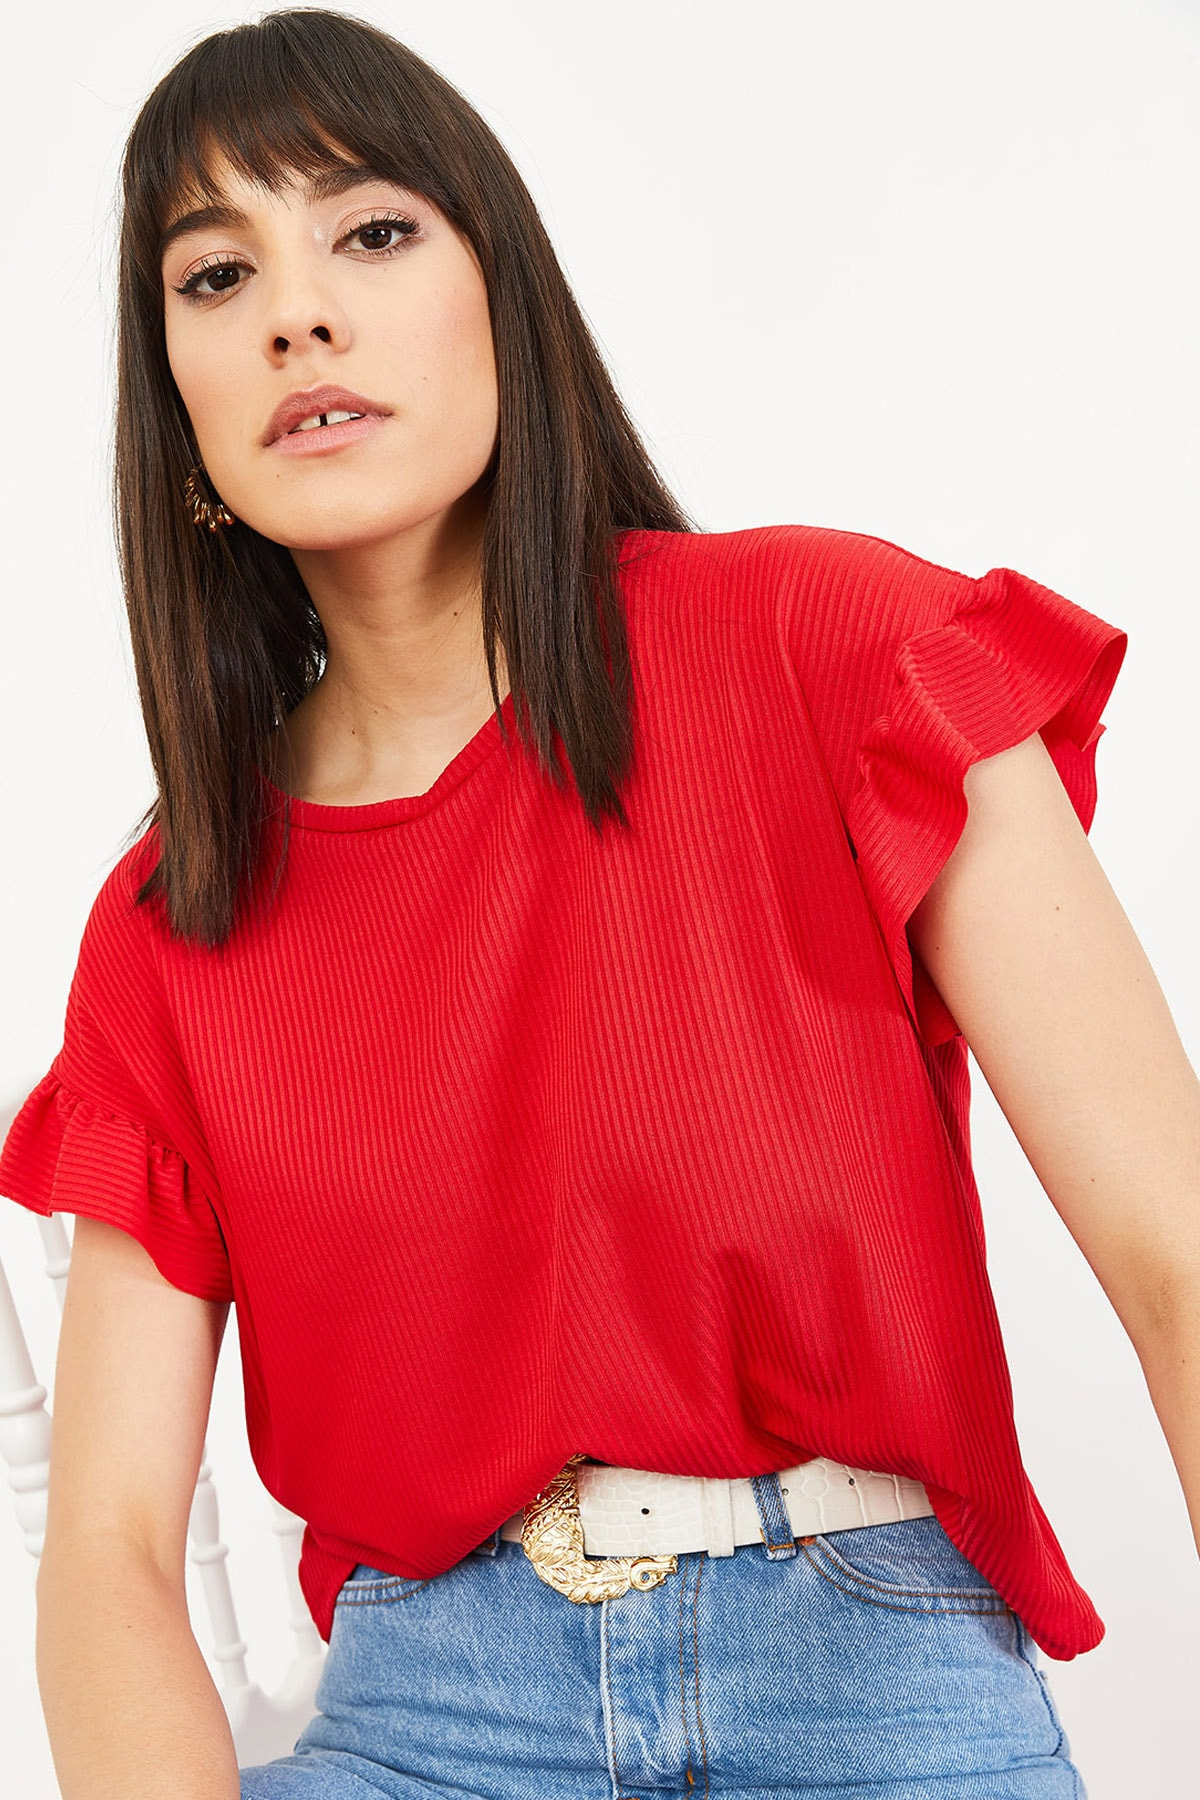 Bianco Lucci Kadın Kırmızı Kolu Fırfırlı Kaşkorse Bluz 10051015 3